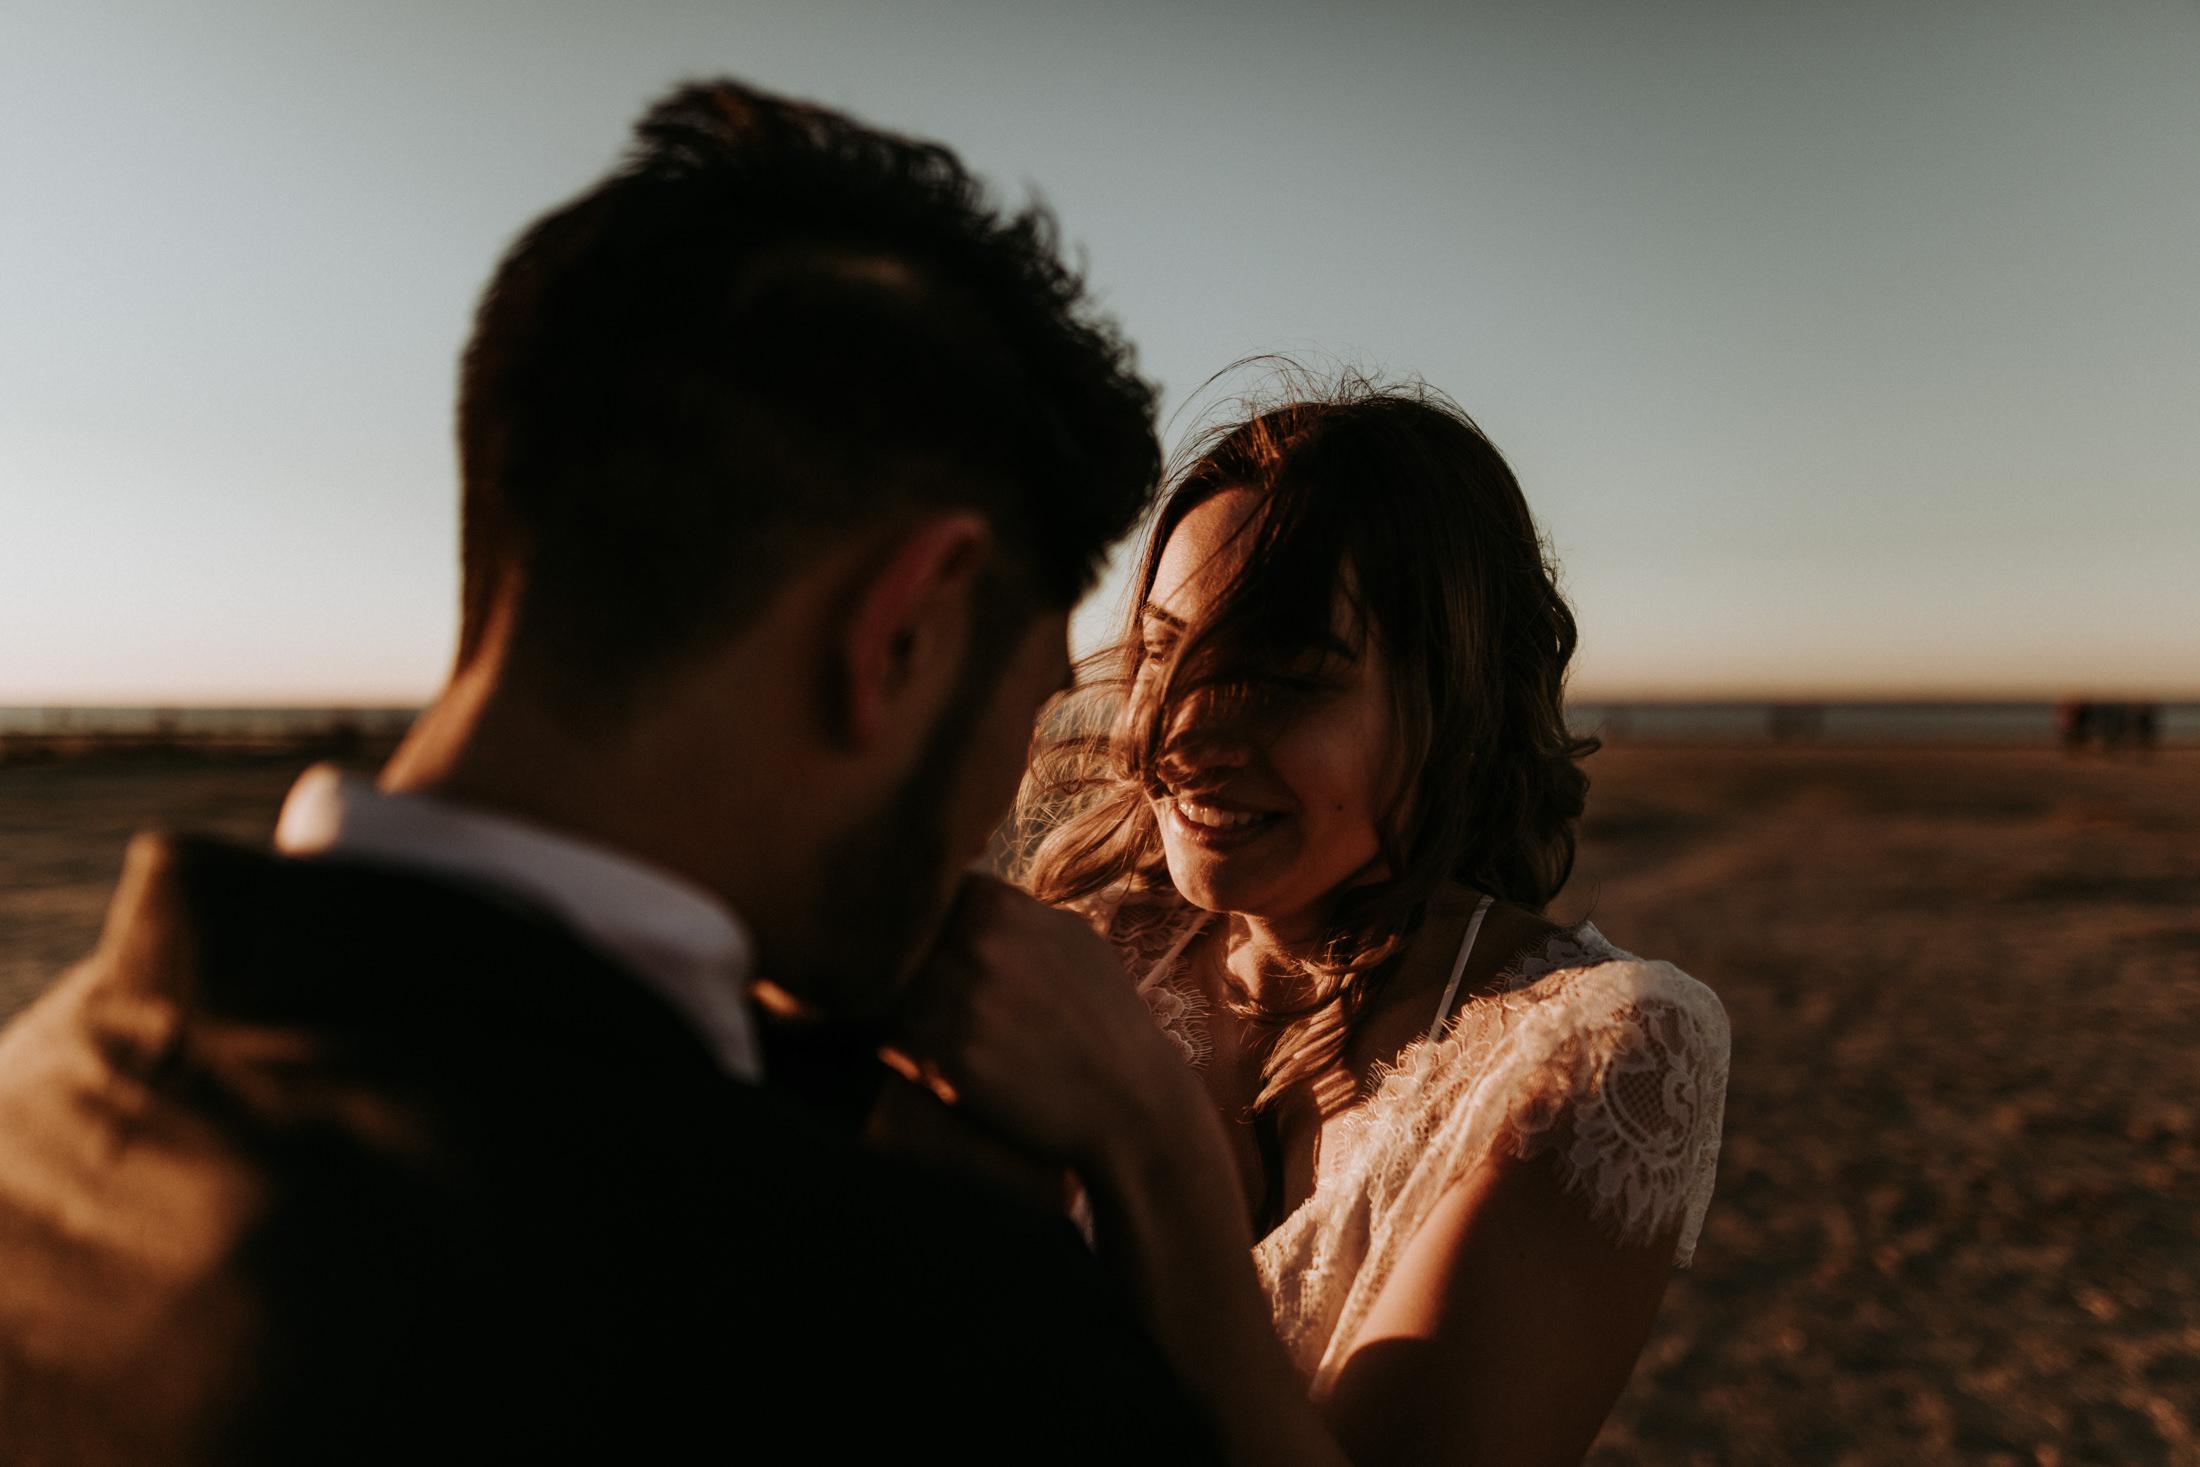 Wedding_Photographer_Mallorca_Daniela-Marquardt_Photography_CanaryIslands_Lanzarote_Iceland_Tuskany_Santorini_Portugal_Schweiz_Austria_Bayern_Elopement_Hochzeitsfotograf_Norddeichich_67